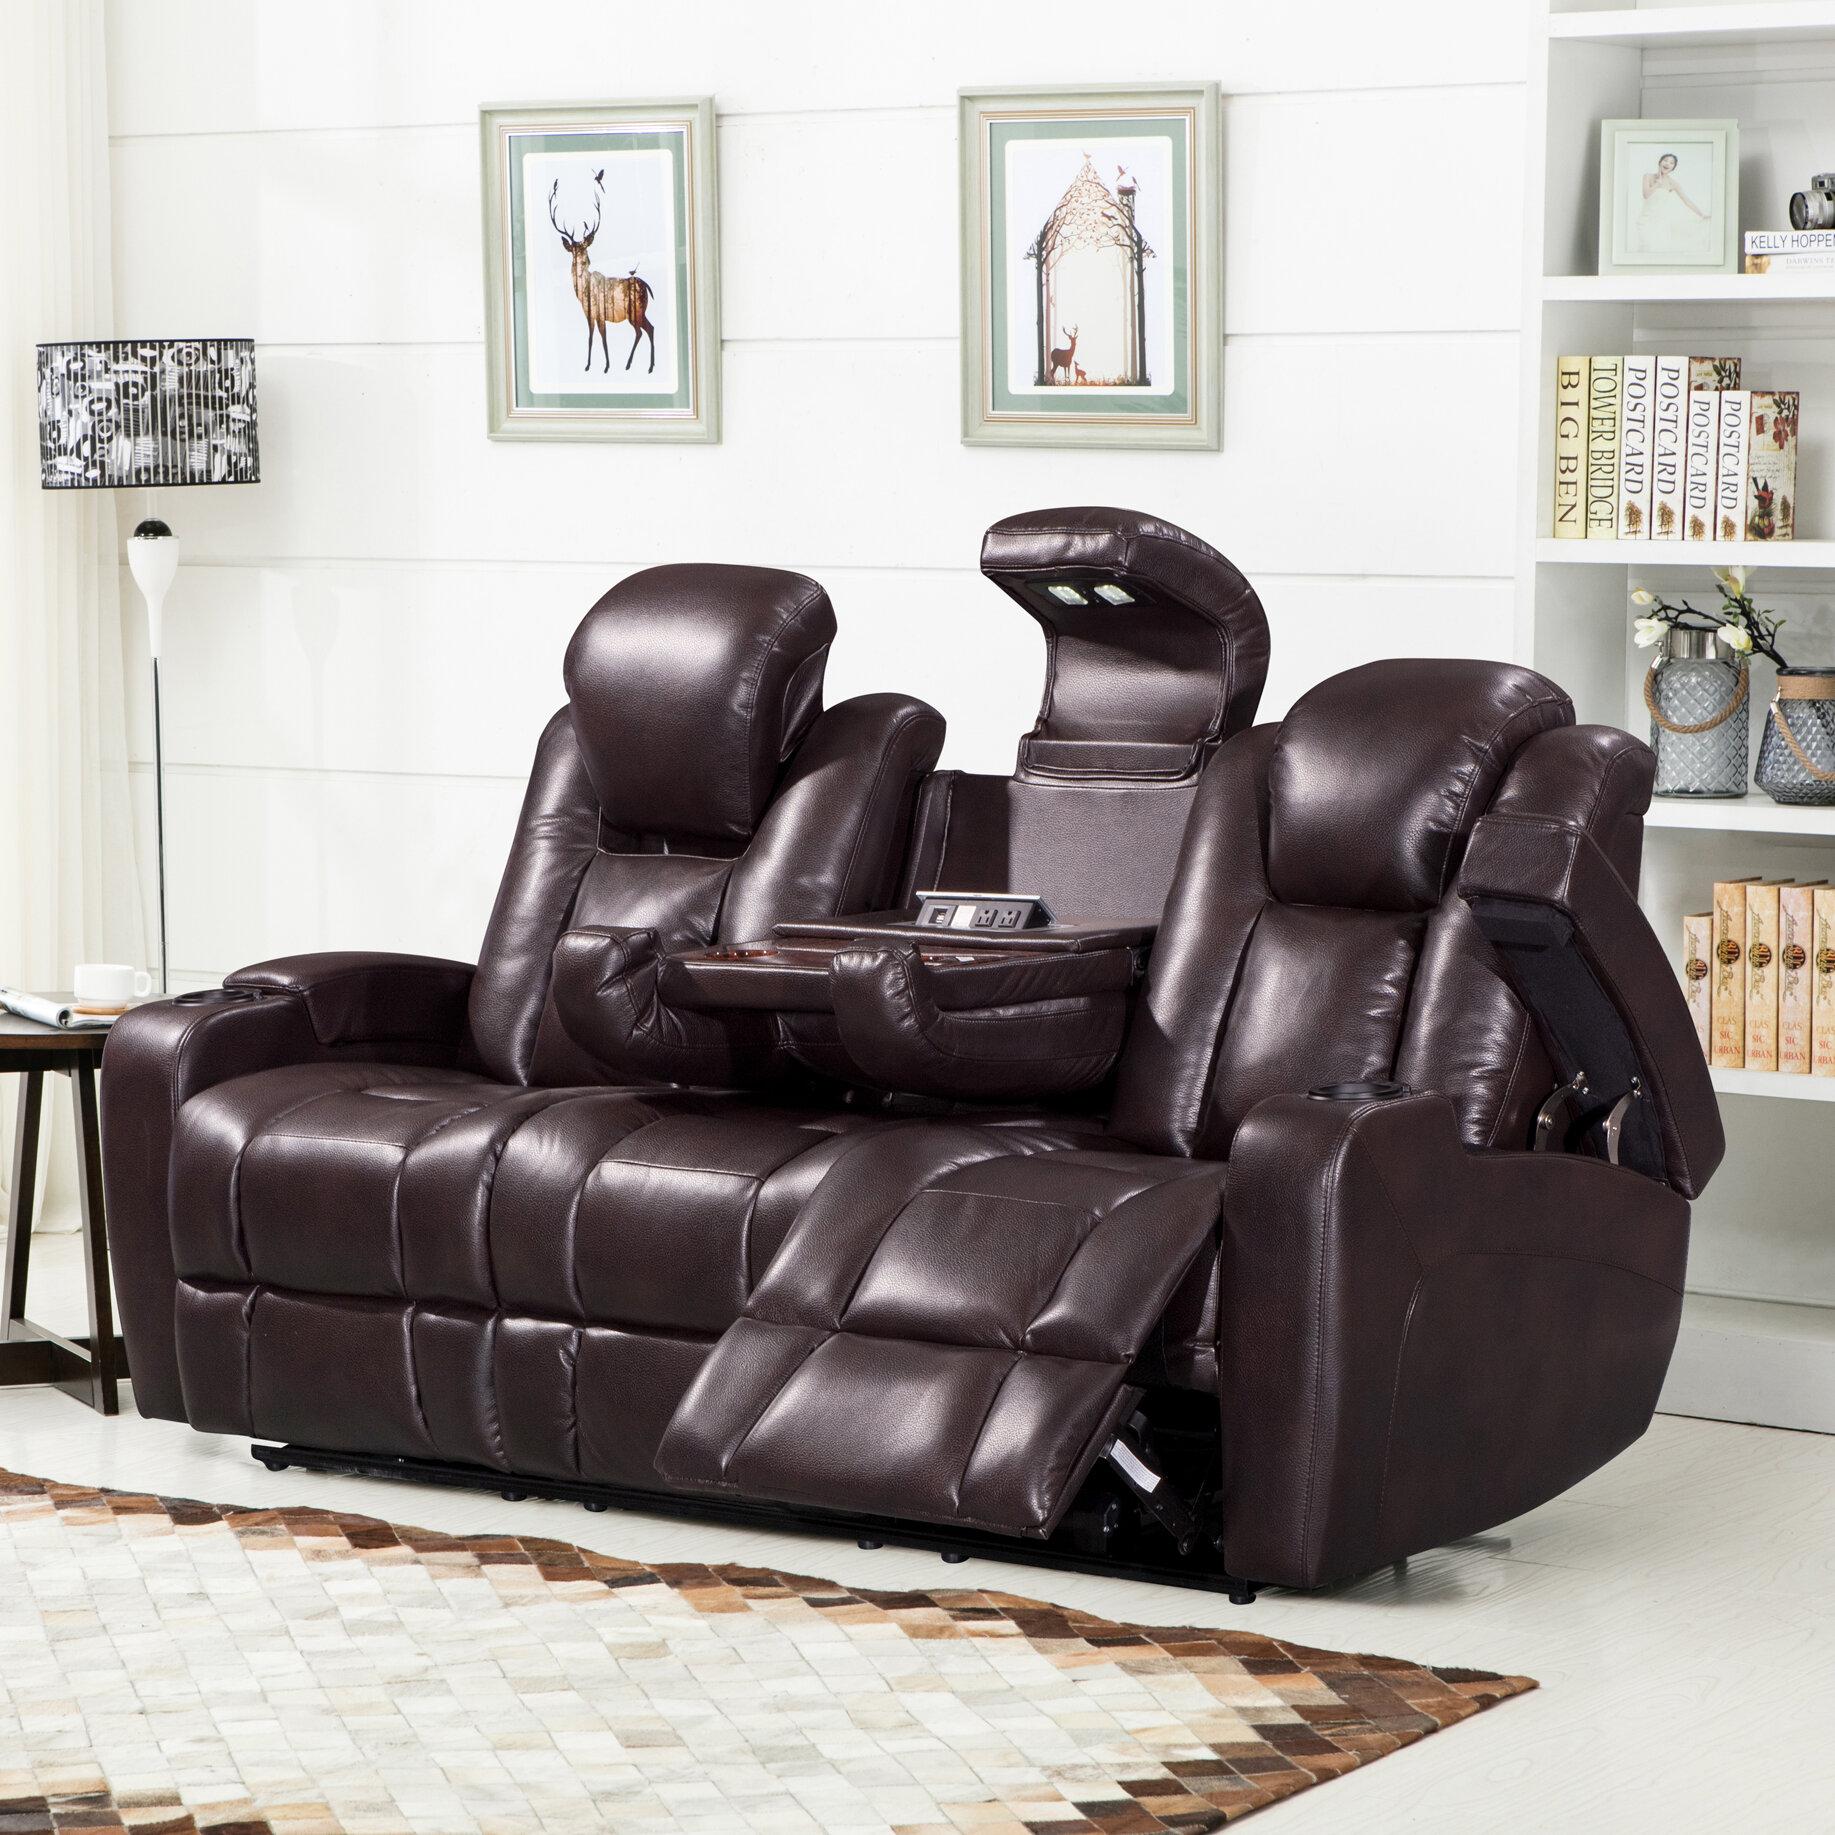 Red barrel studio piccadilly air transforming power reclining sofa reviews wayfair